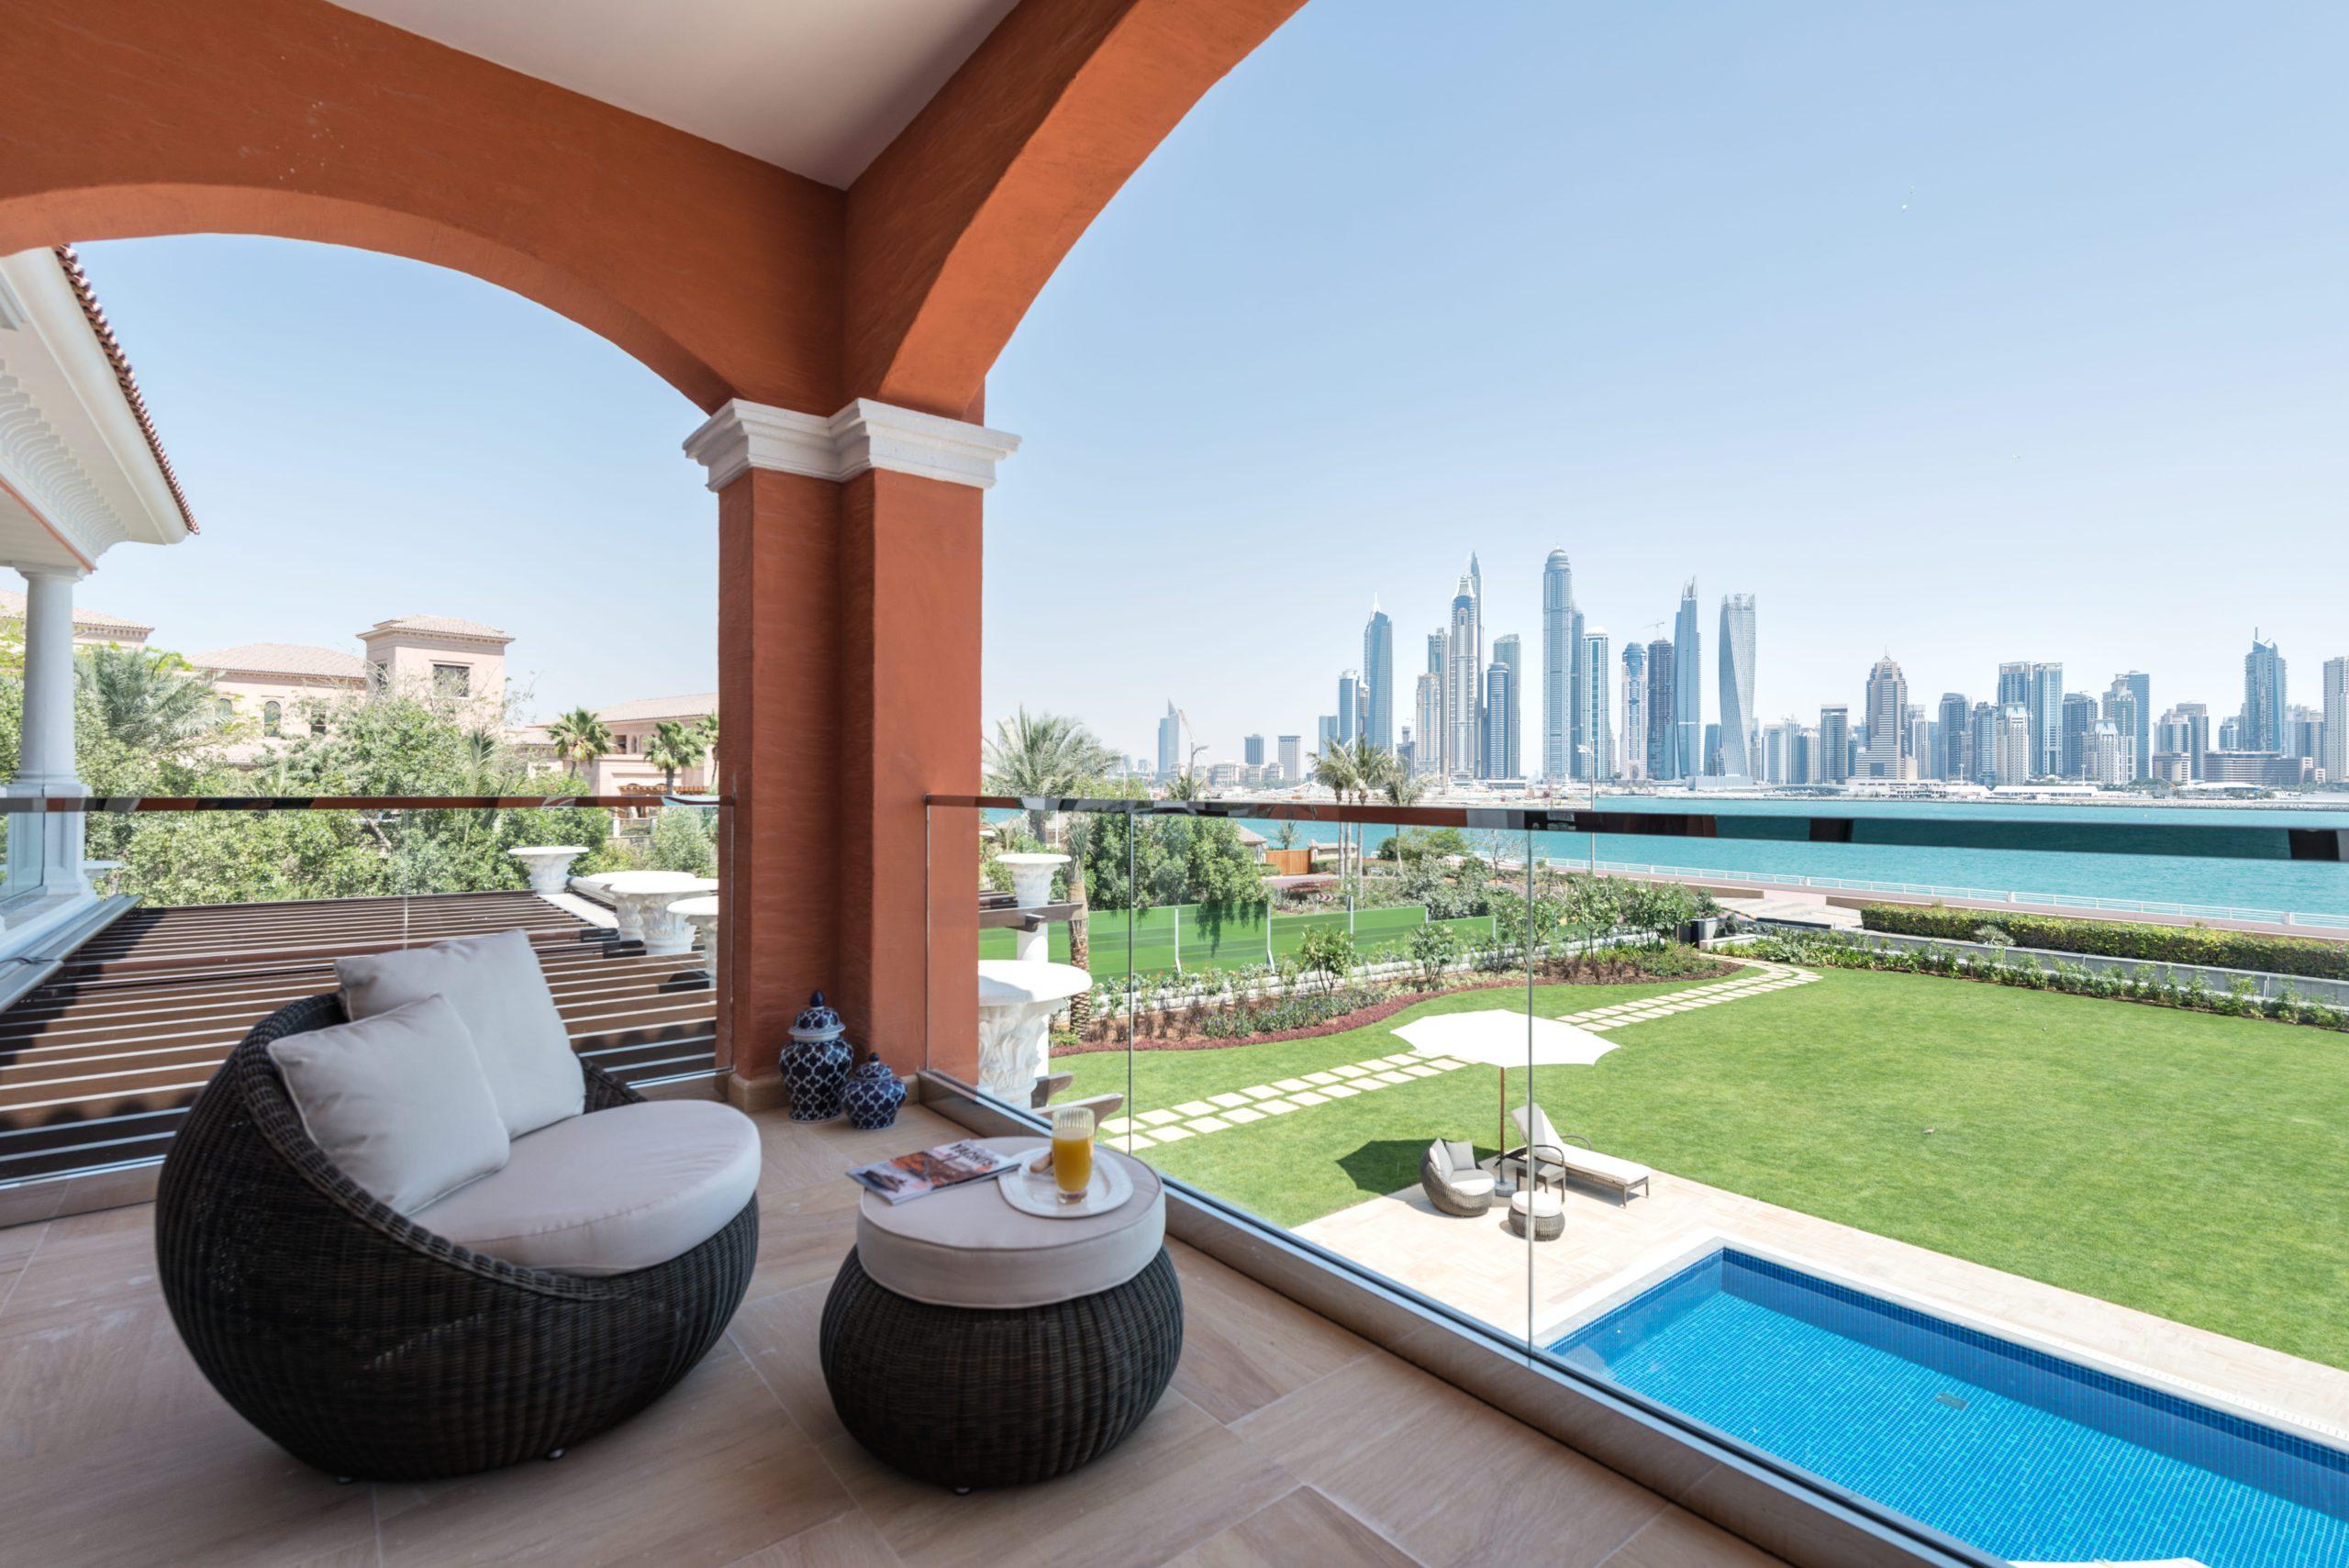 Фото квартиры в ОАЭ